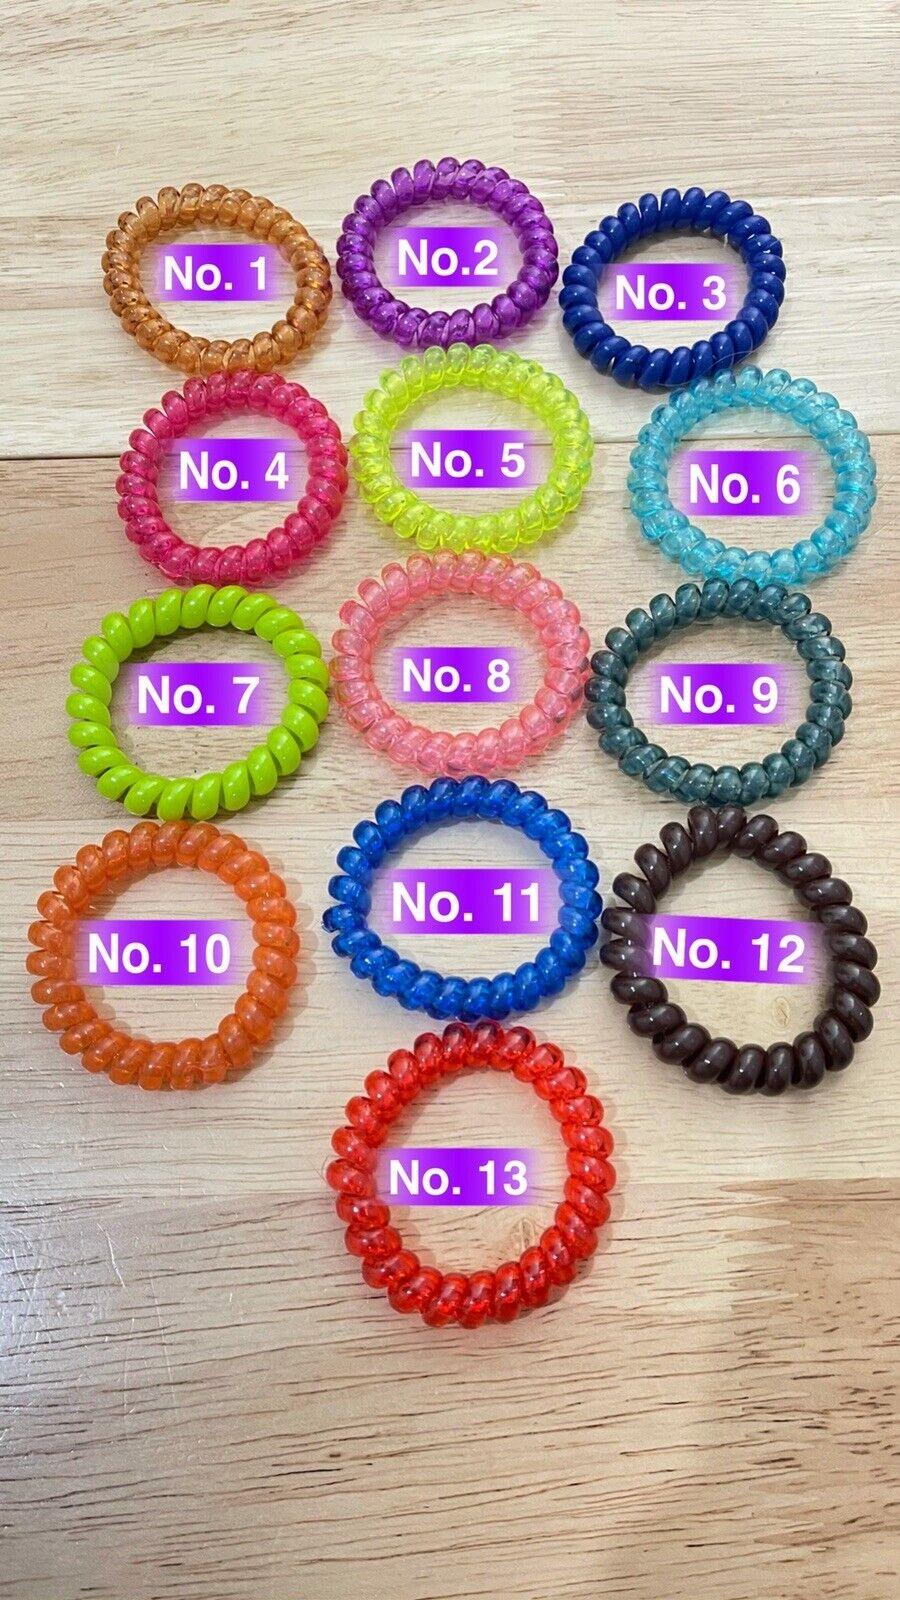 Women's/Girl's Quality Hair Bobbles Bands 13 Styles Spiral Random Colour 5 Pack